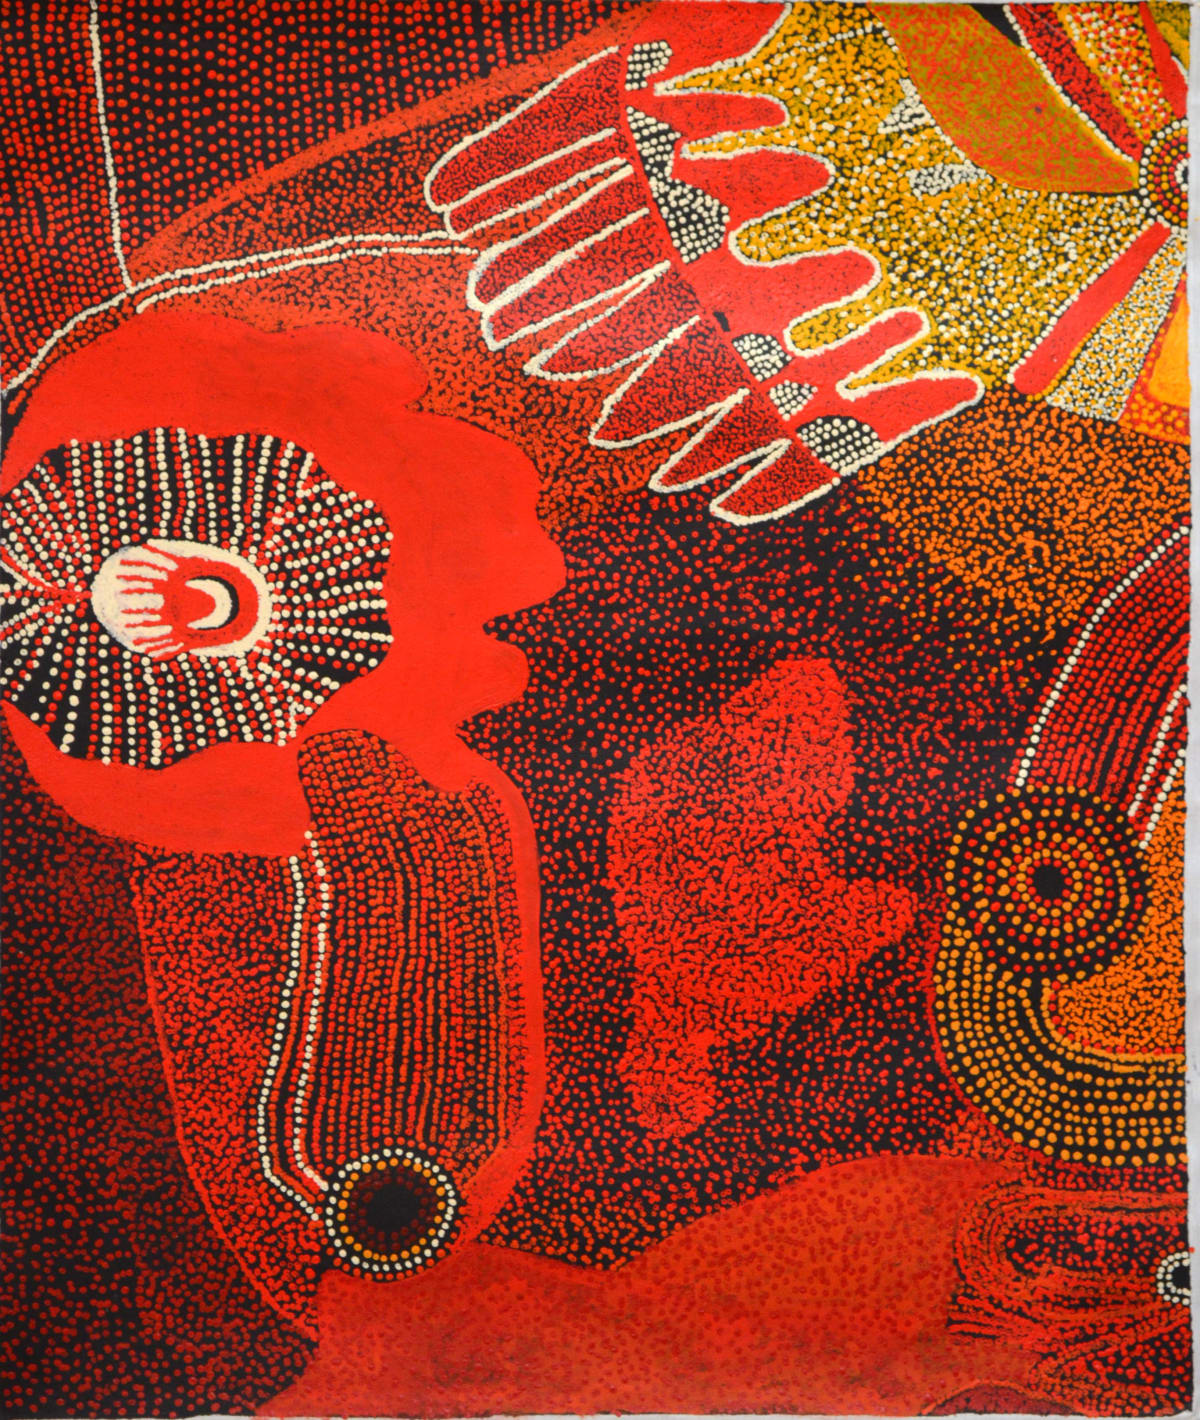 Bradley Tunkin Kalaya Tjukurpa (Emu Dreaming) acrylic on linen 100 x 120 cm